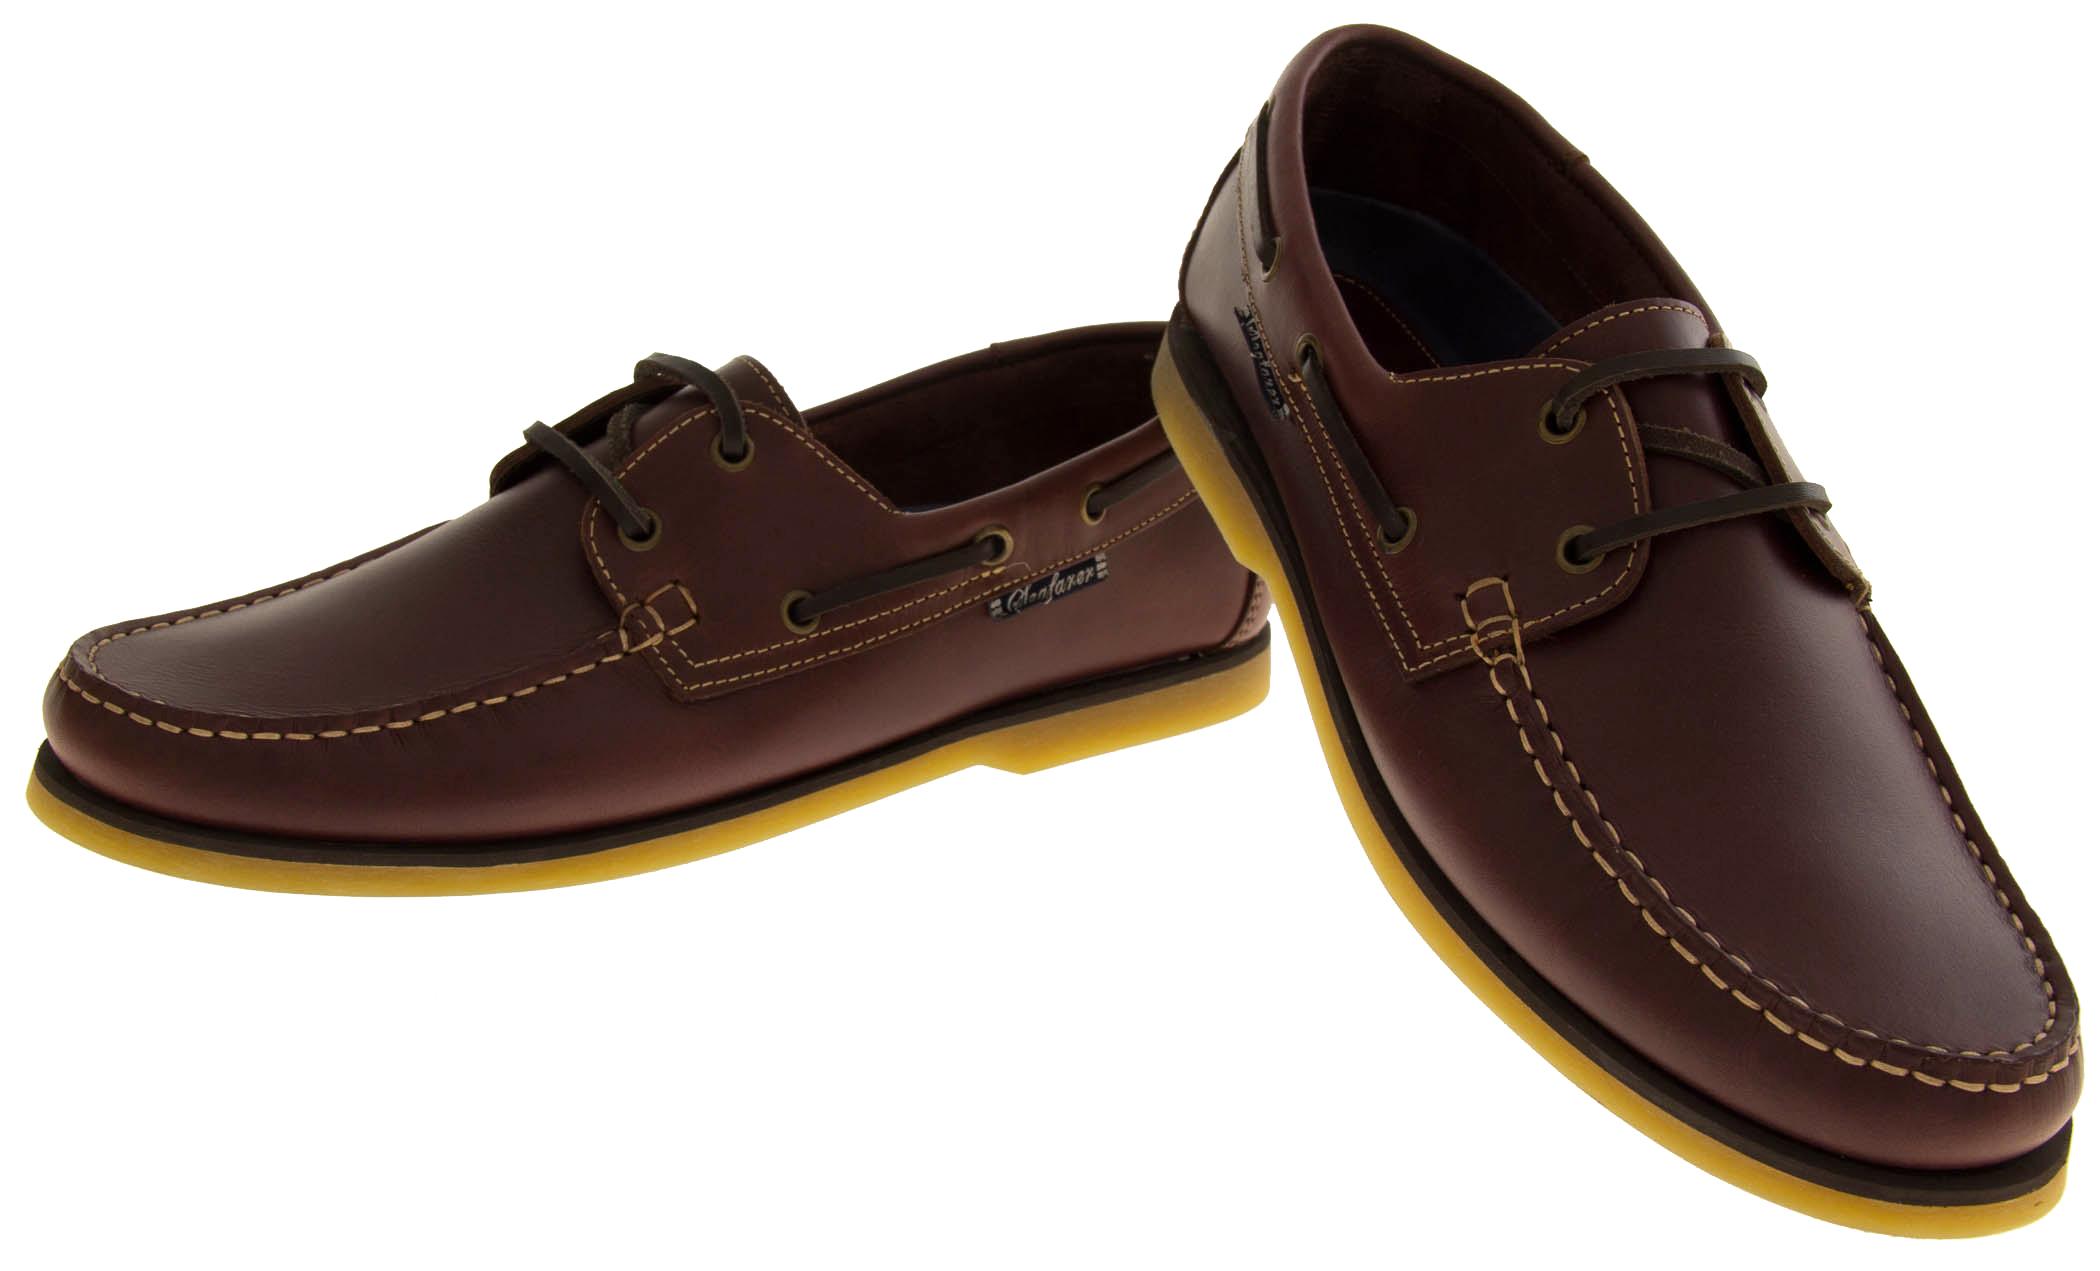 Seafarer Shoes Uk